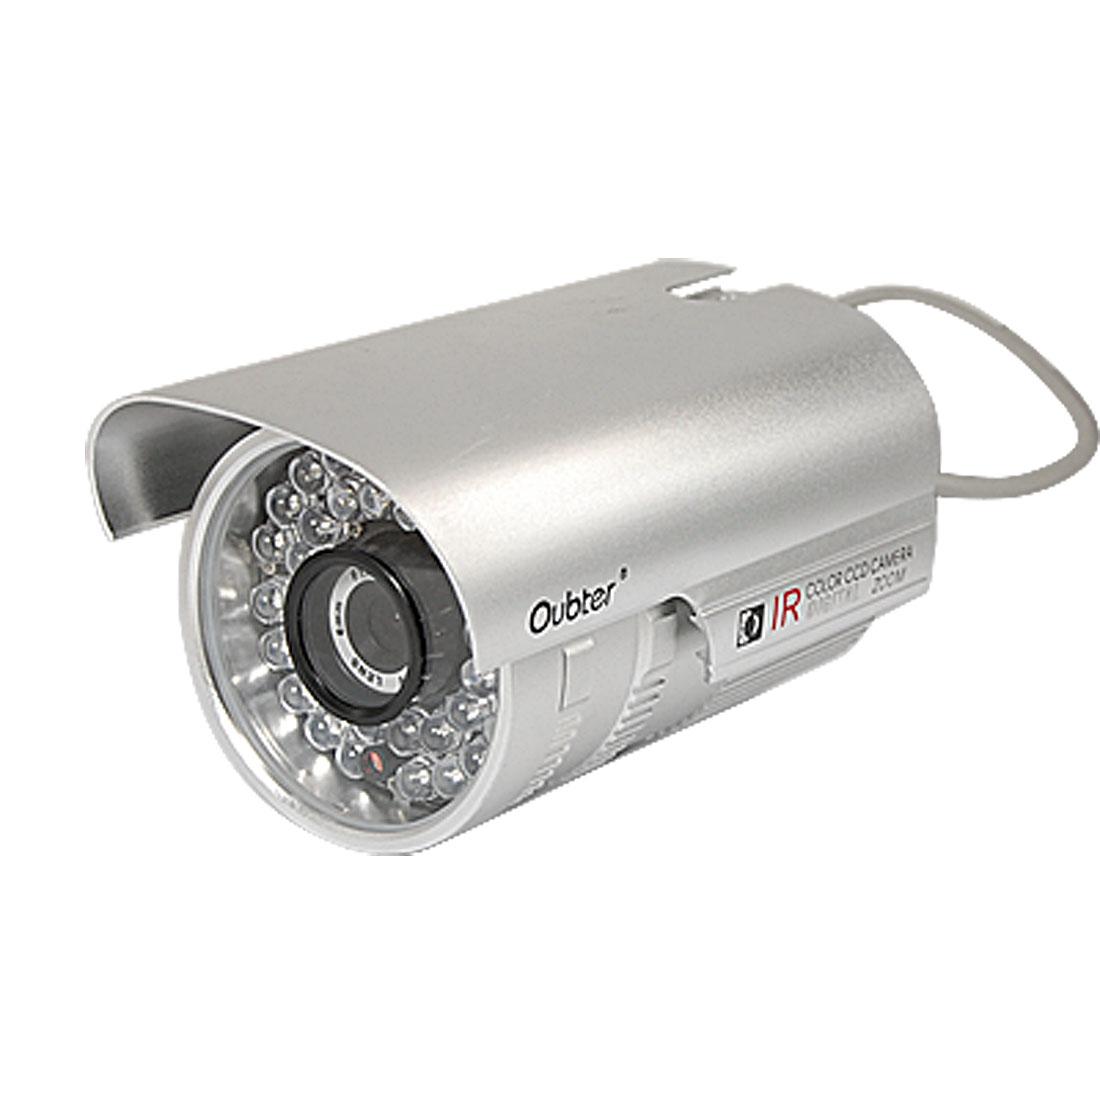 "1/4"" Sharp CCD 36 IR LED Night Vision 420TVL PAL CCTV Security Camera 6mm Lens"